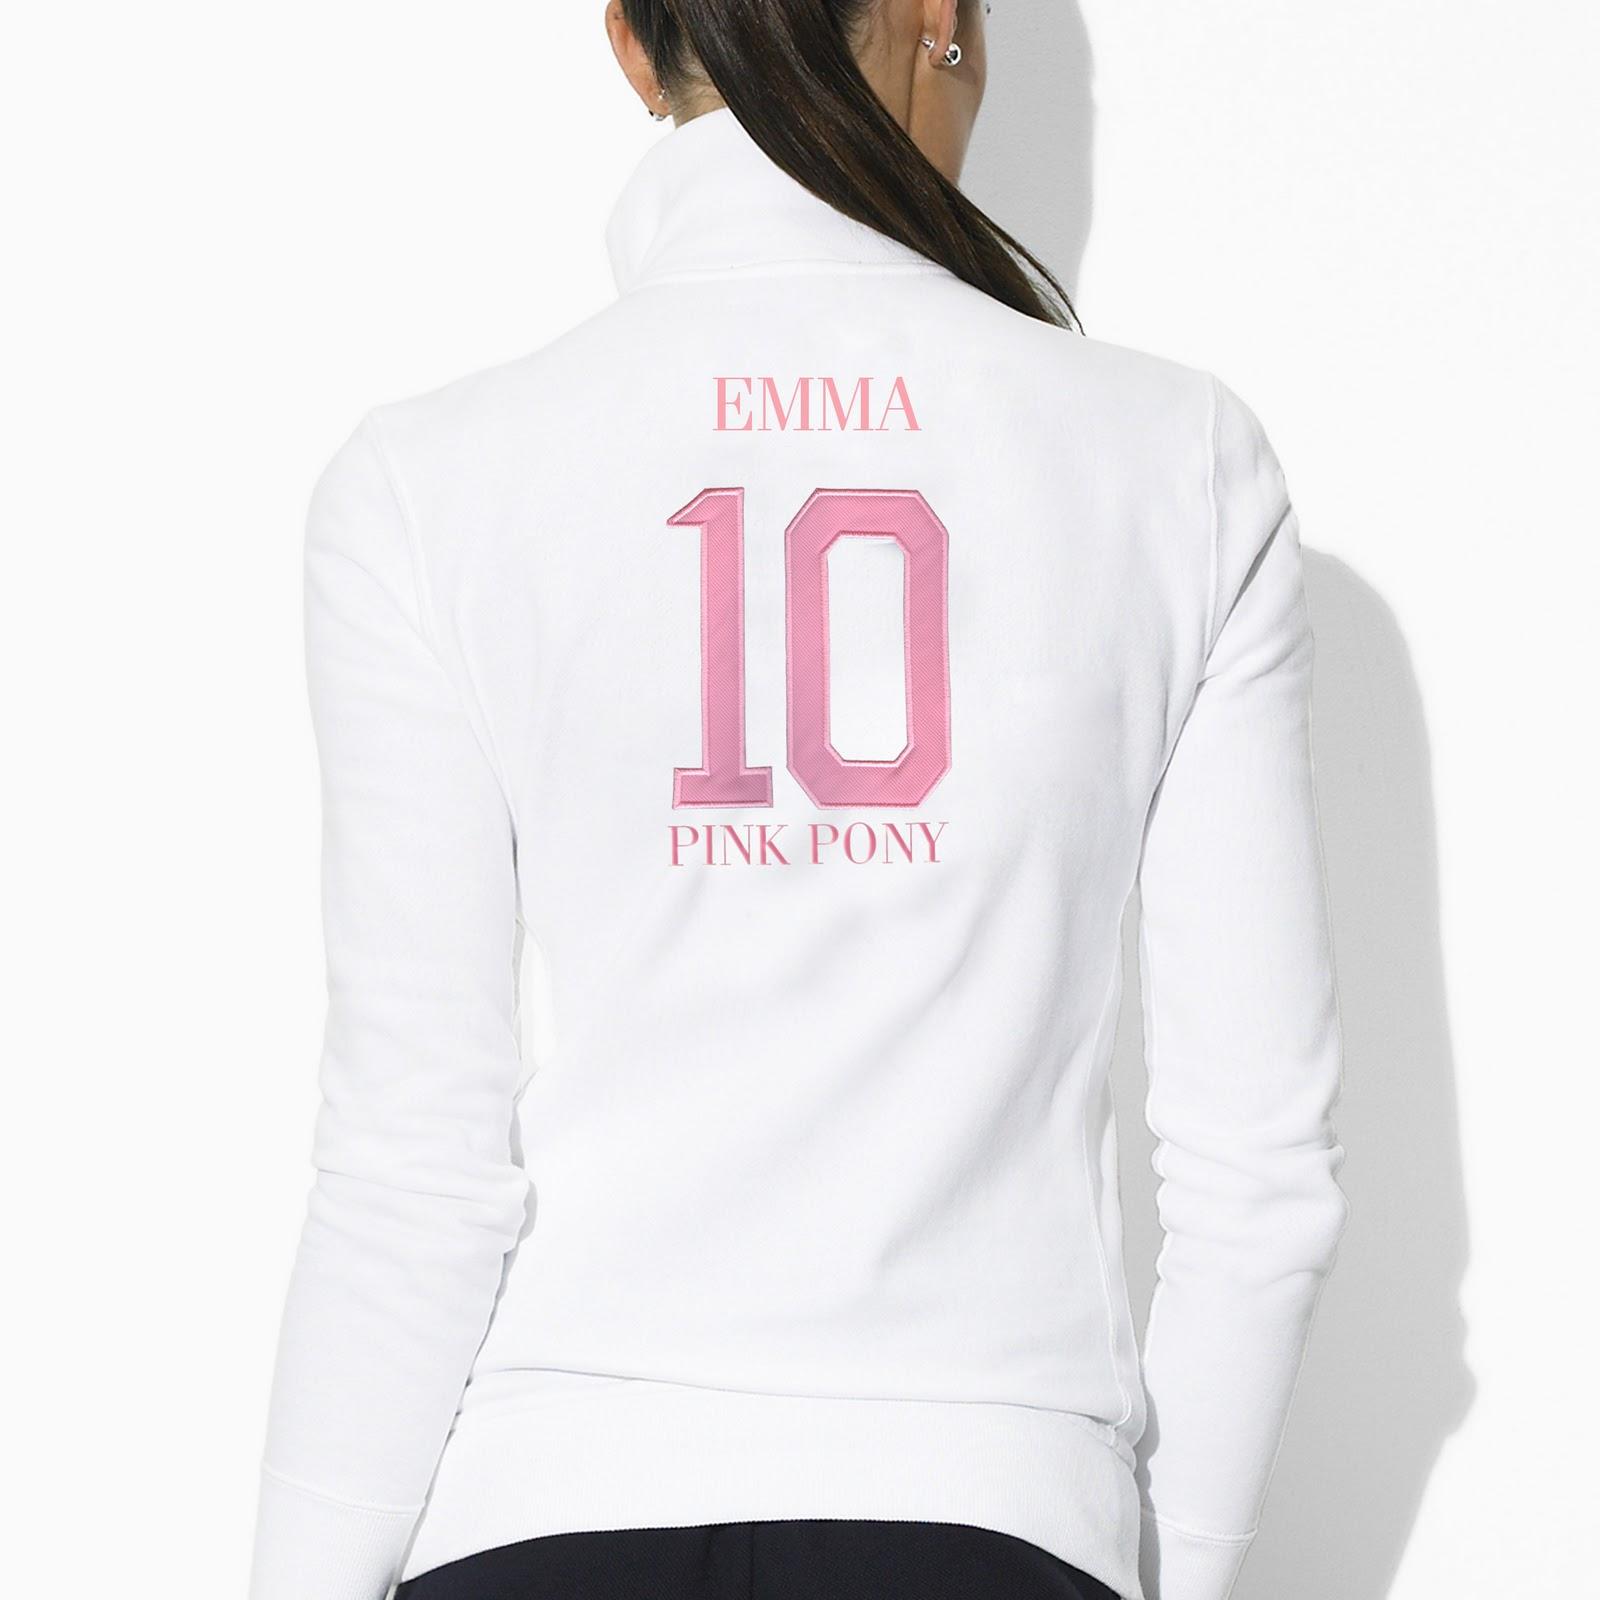 http://1.bp.blogspot.com/-HJHFaiqiXyw/TY9A_5fyYXI/AAAAAAAAS6c/qD26yexELFQ/s1600/pink+pony+ralph+lauren.jpg